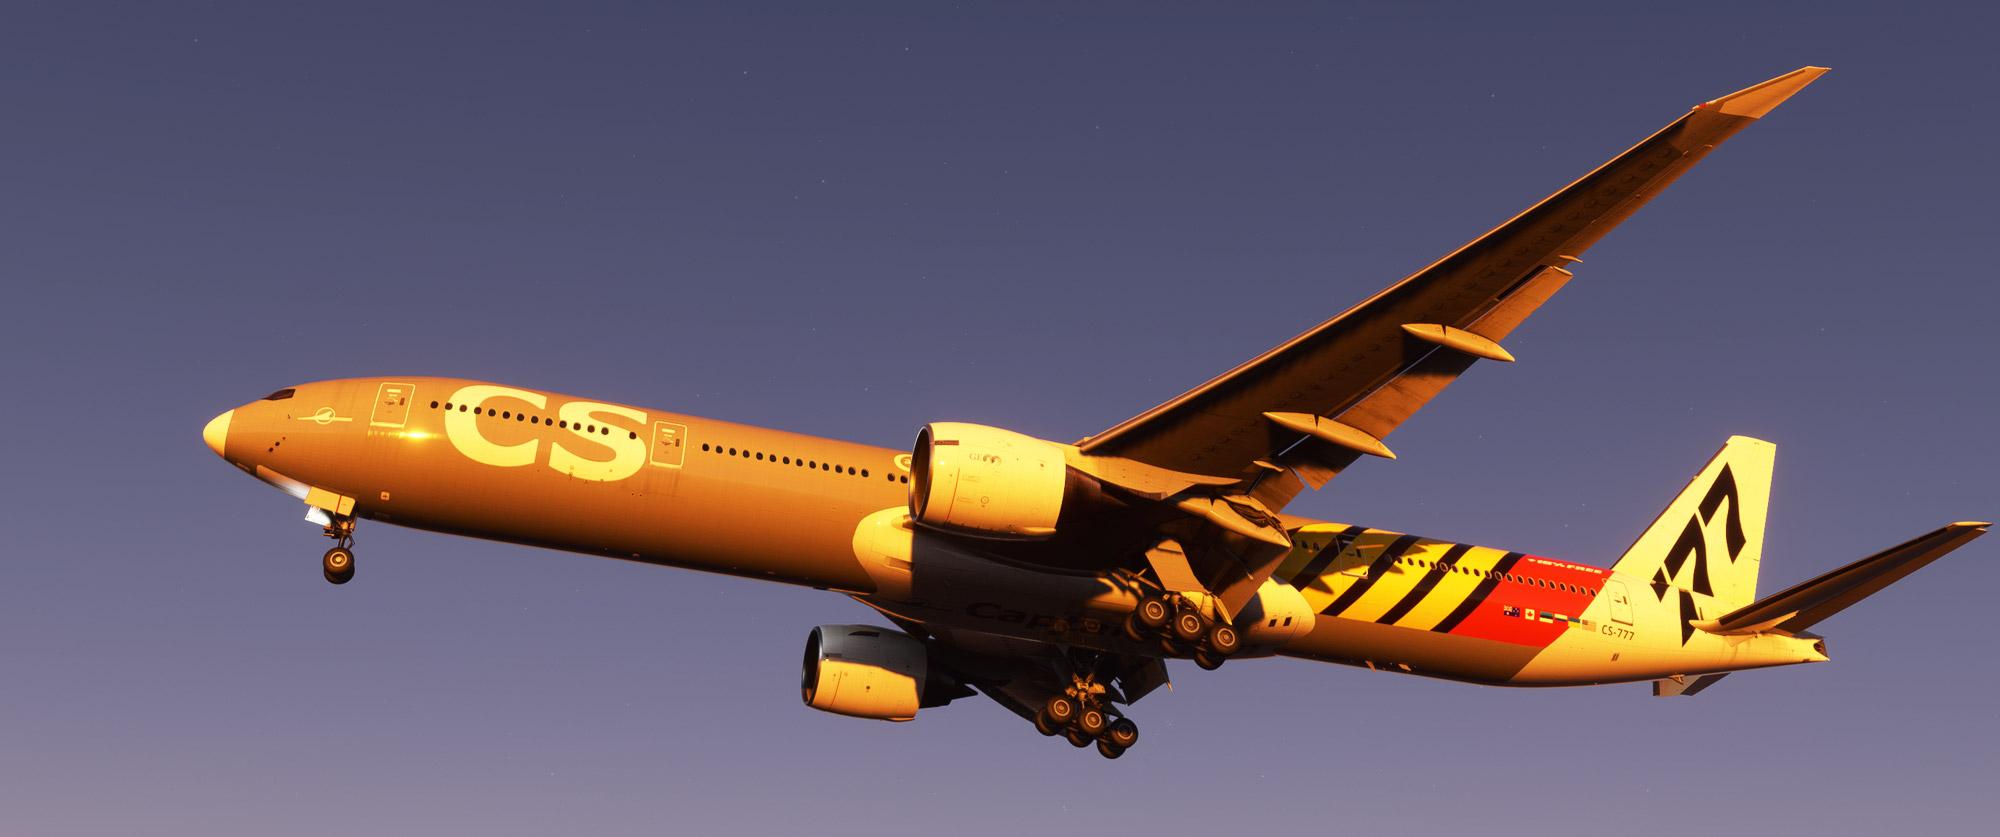 777-300